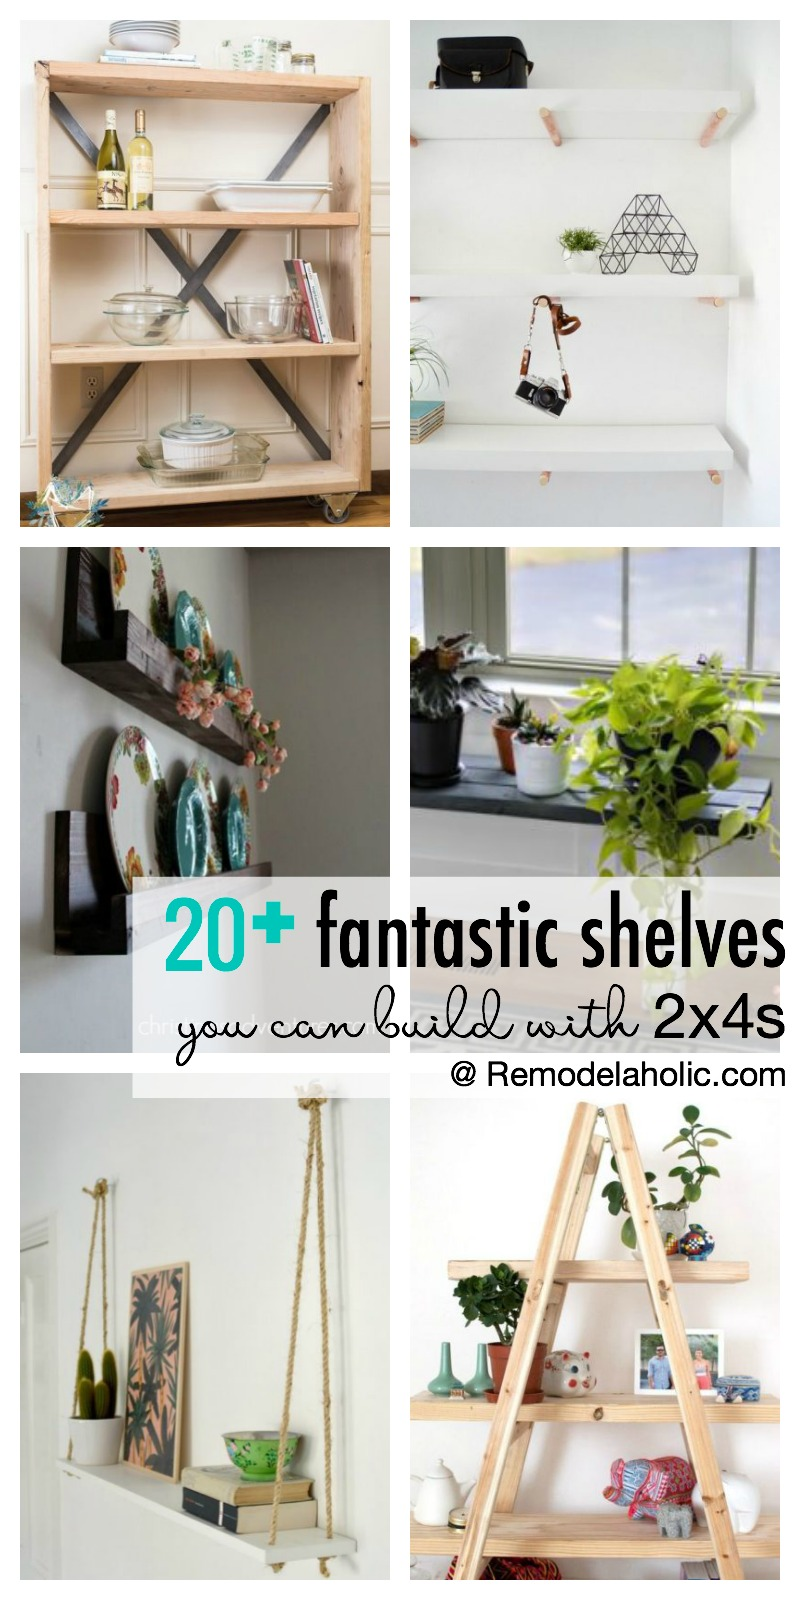 foto de Remodelaholic | 20+ Fantastic DIY 2x4 Shelving Ideas